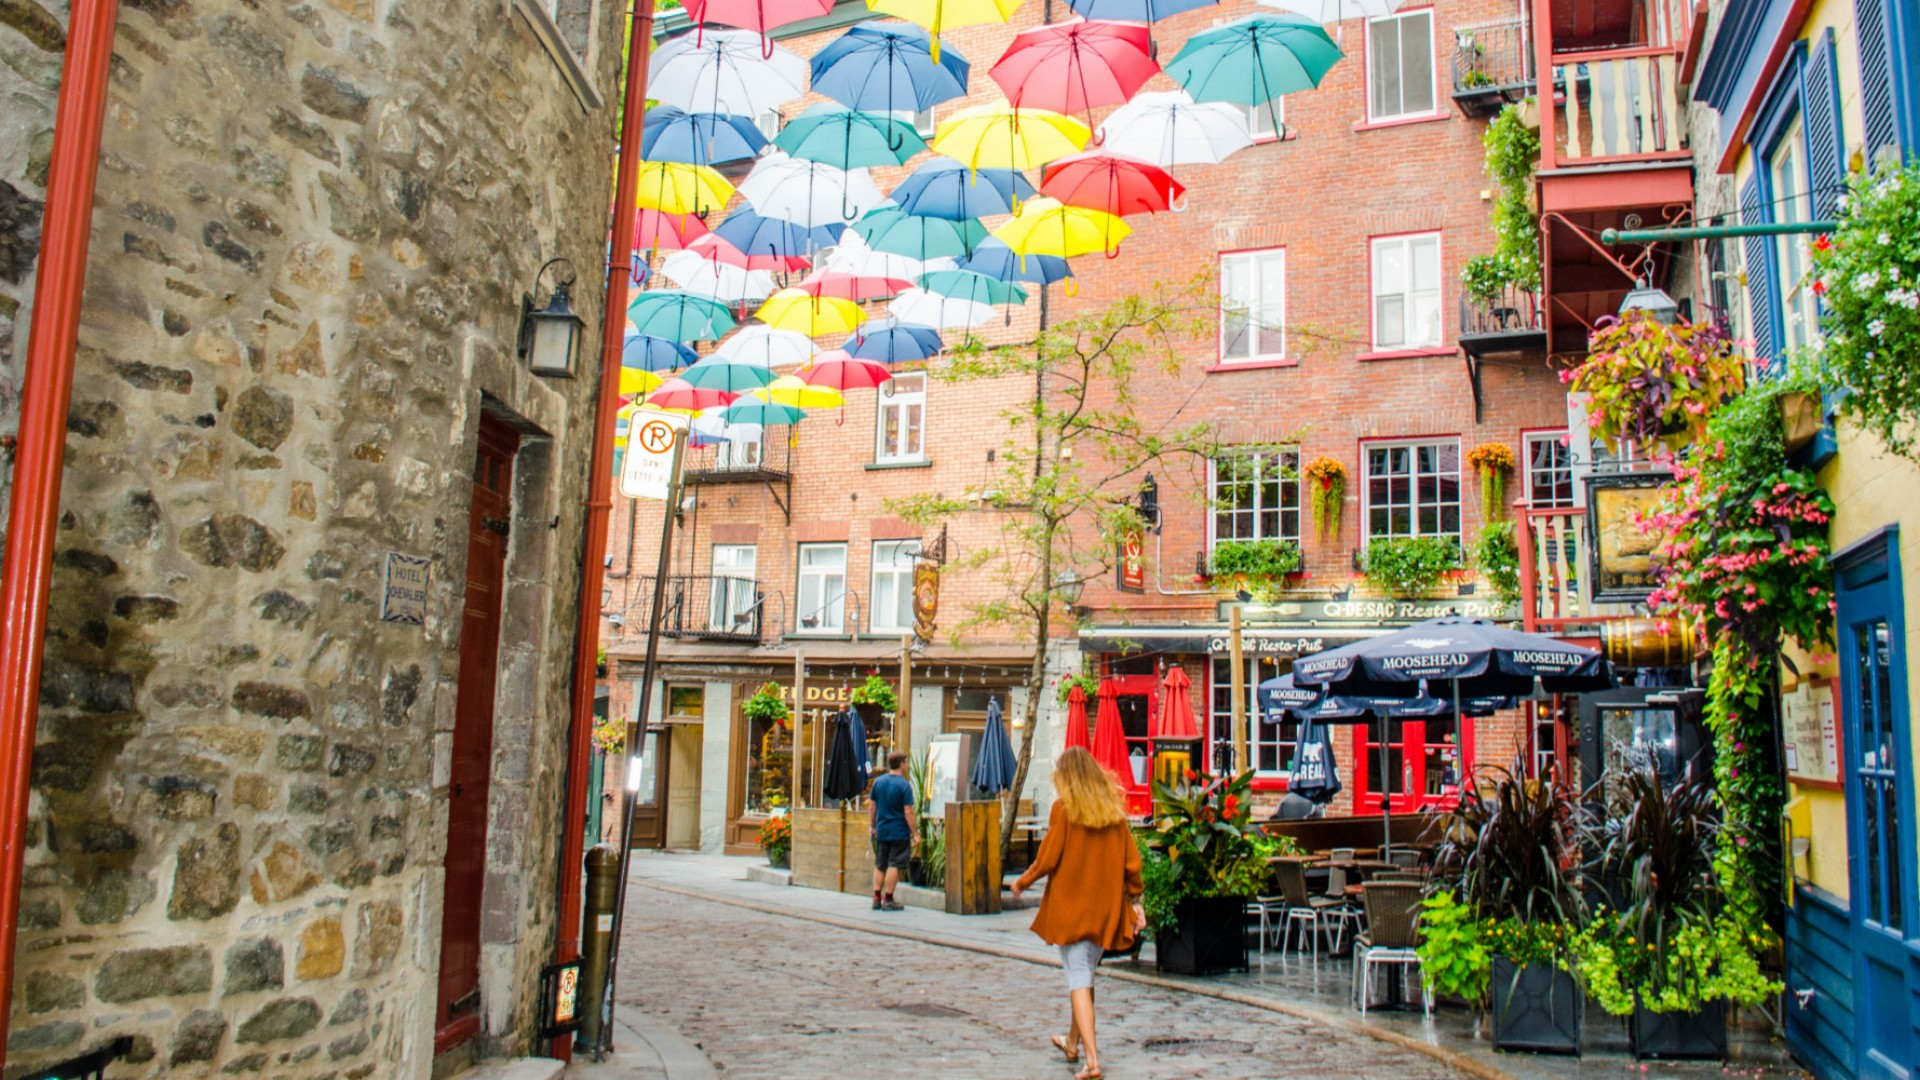 umbrellas hanging above street in quebec